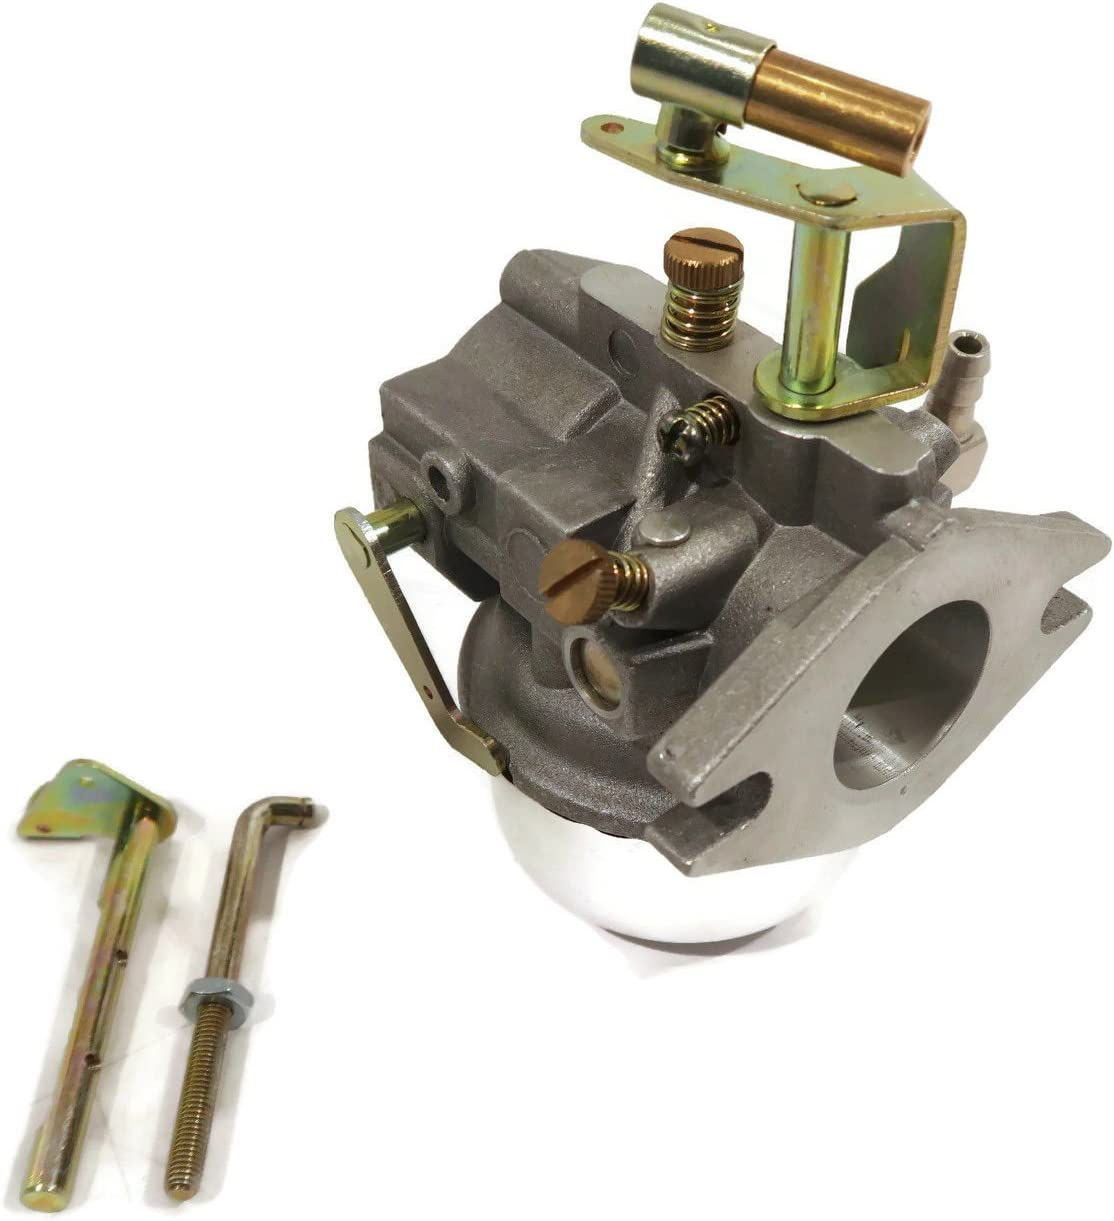 The ROP Shop Carburetor w/ 2 Choke Levers fits Kohler K241 K301 Cast Iron 10 12 HP K-Seriesby